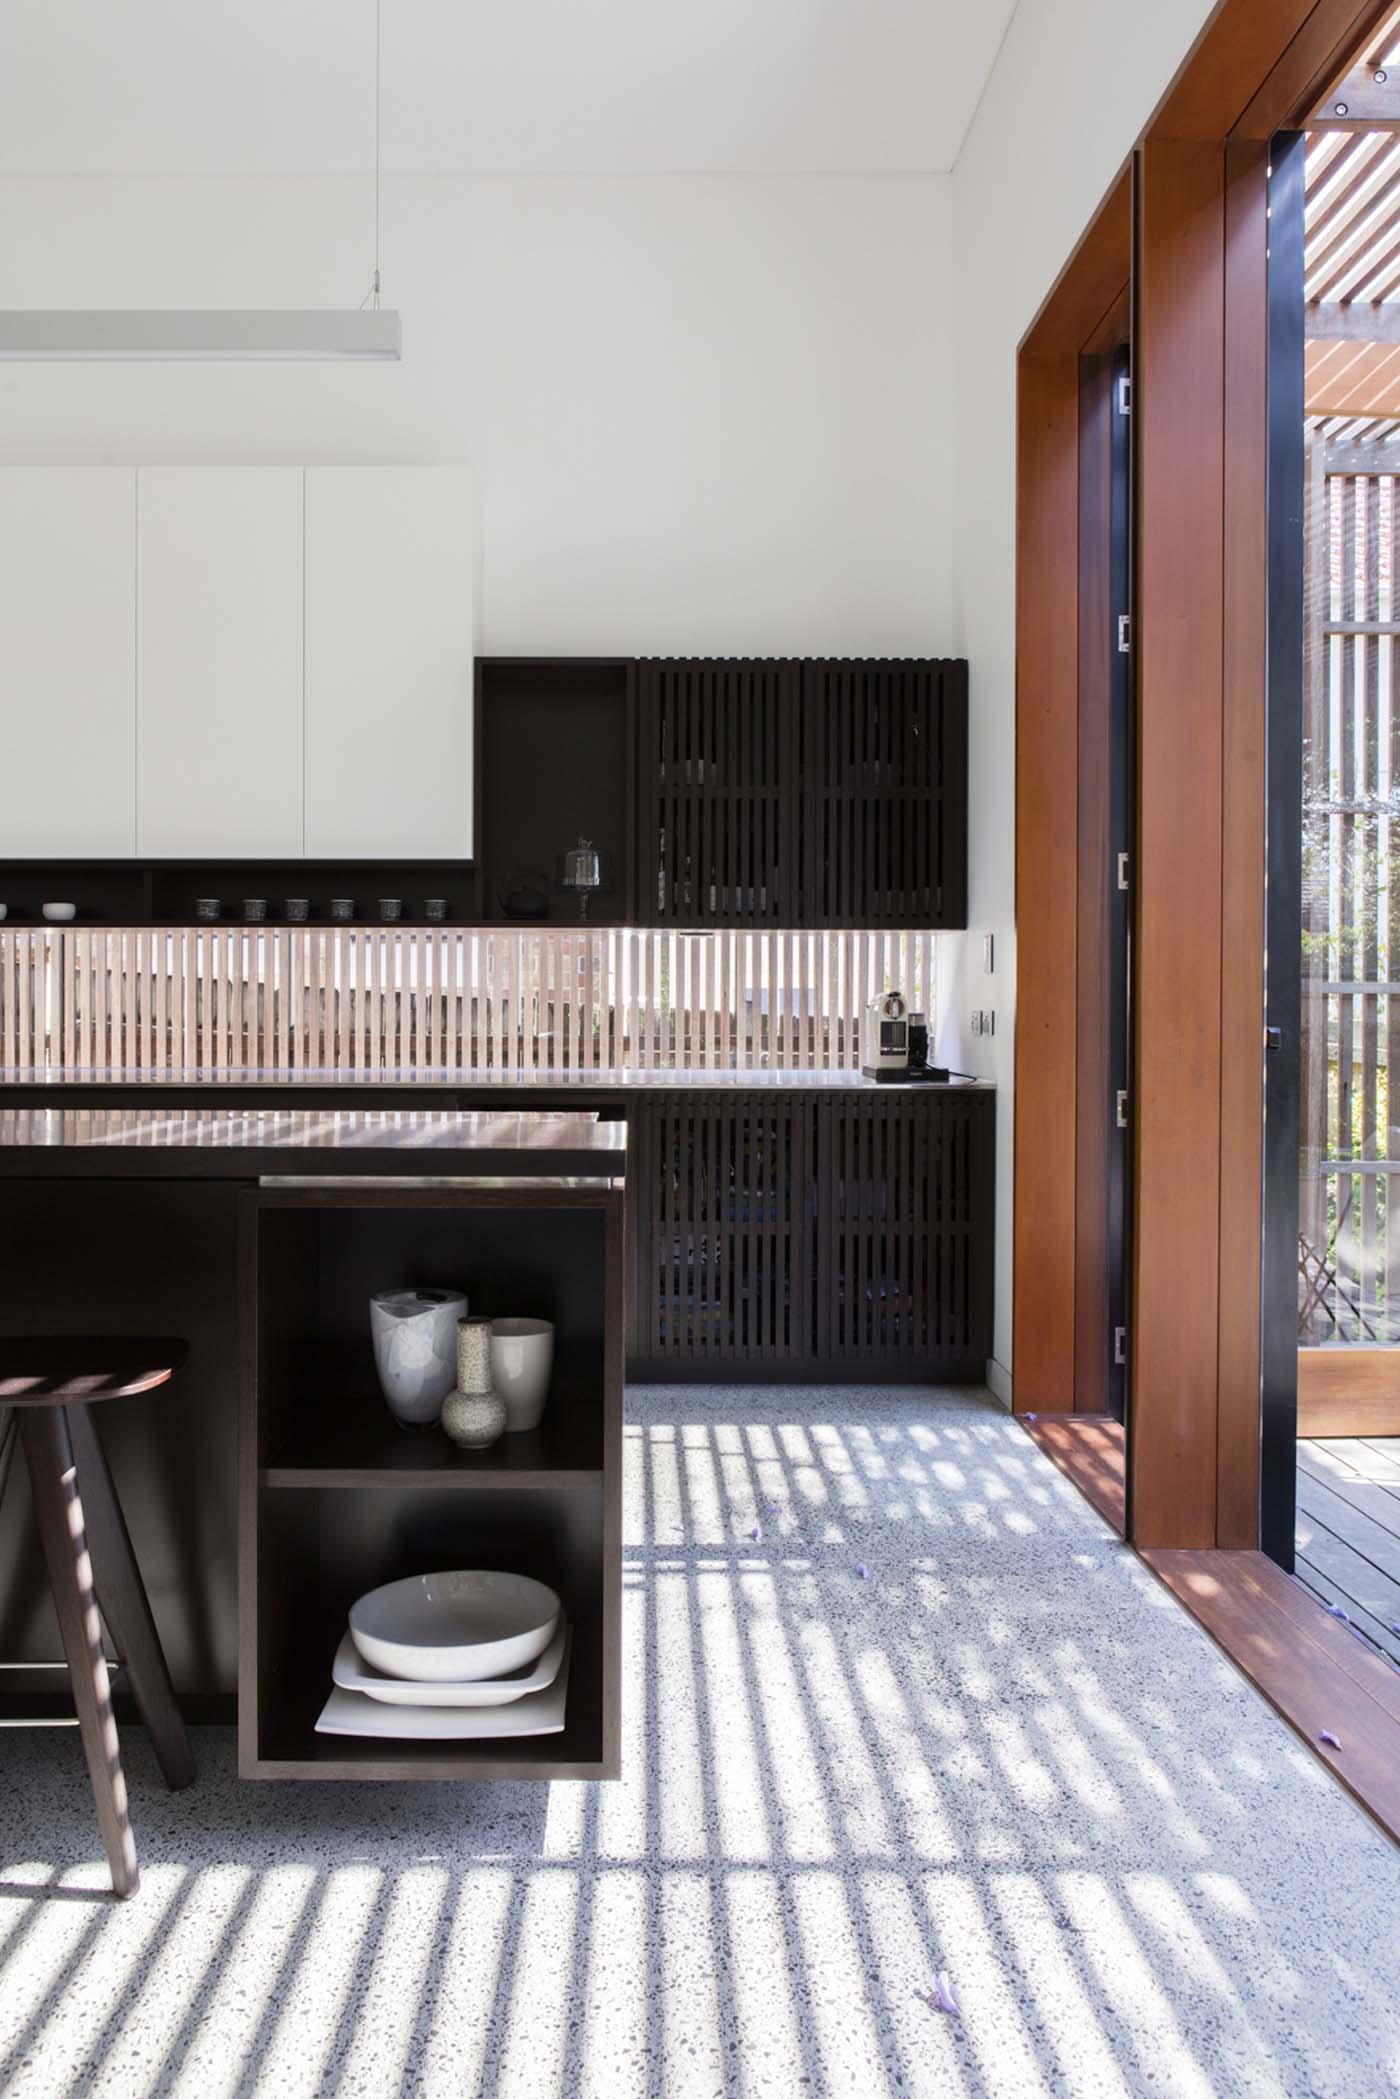 Sung Dobson house by Sam Crawford Architects, Sydney. Modern open-plan kitchen.